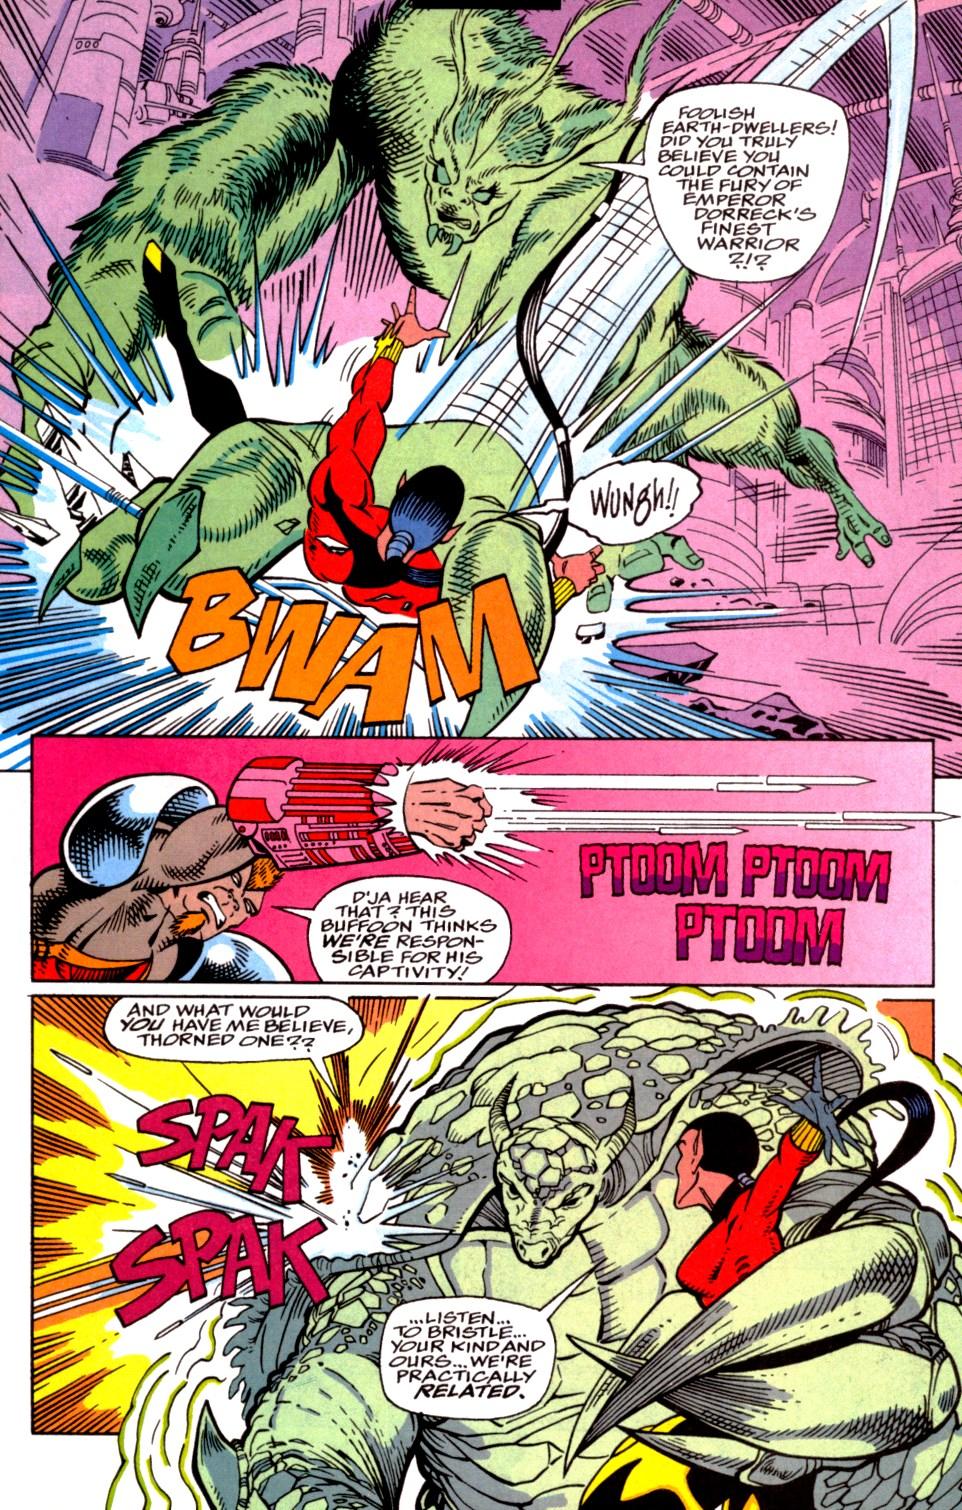 Read online Blackwulf comic -  Issue #4 - 14